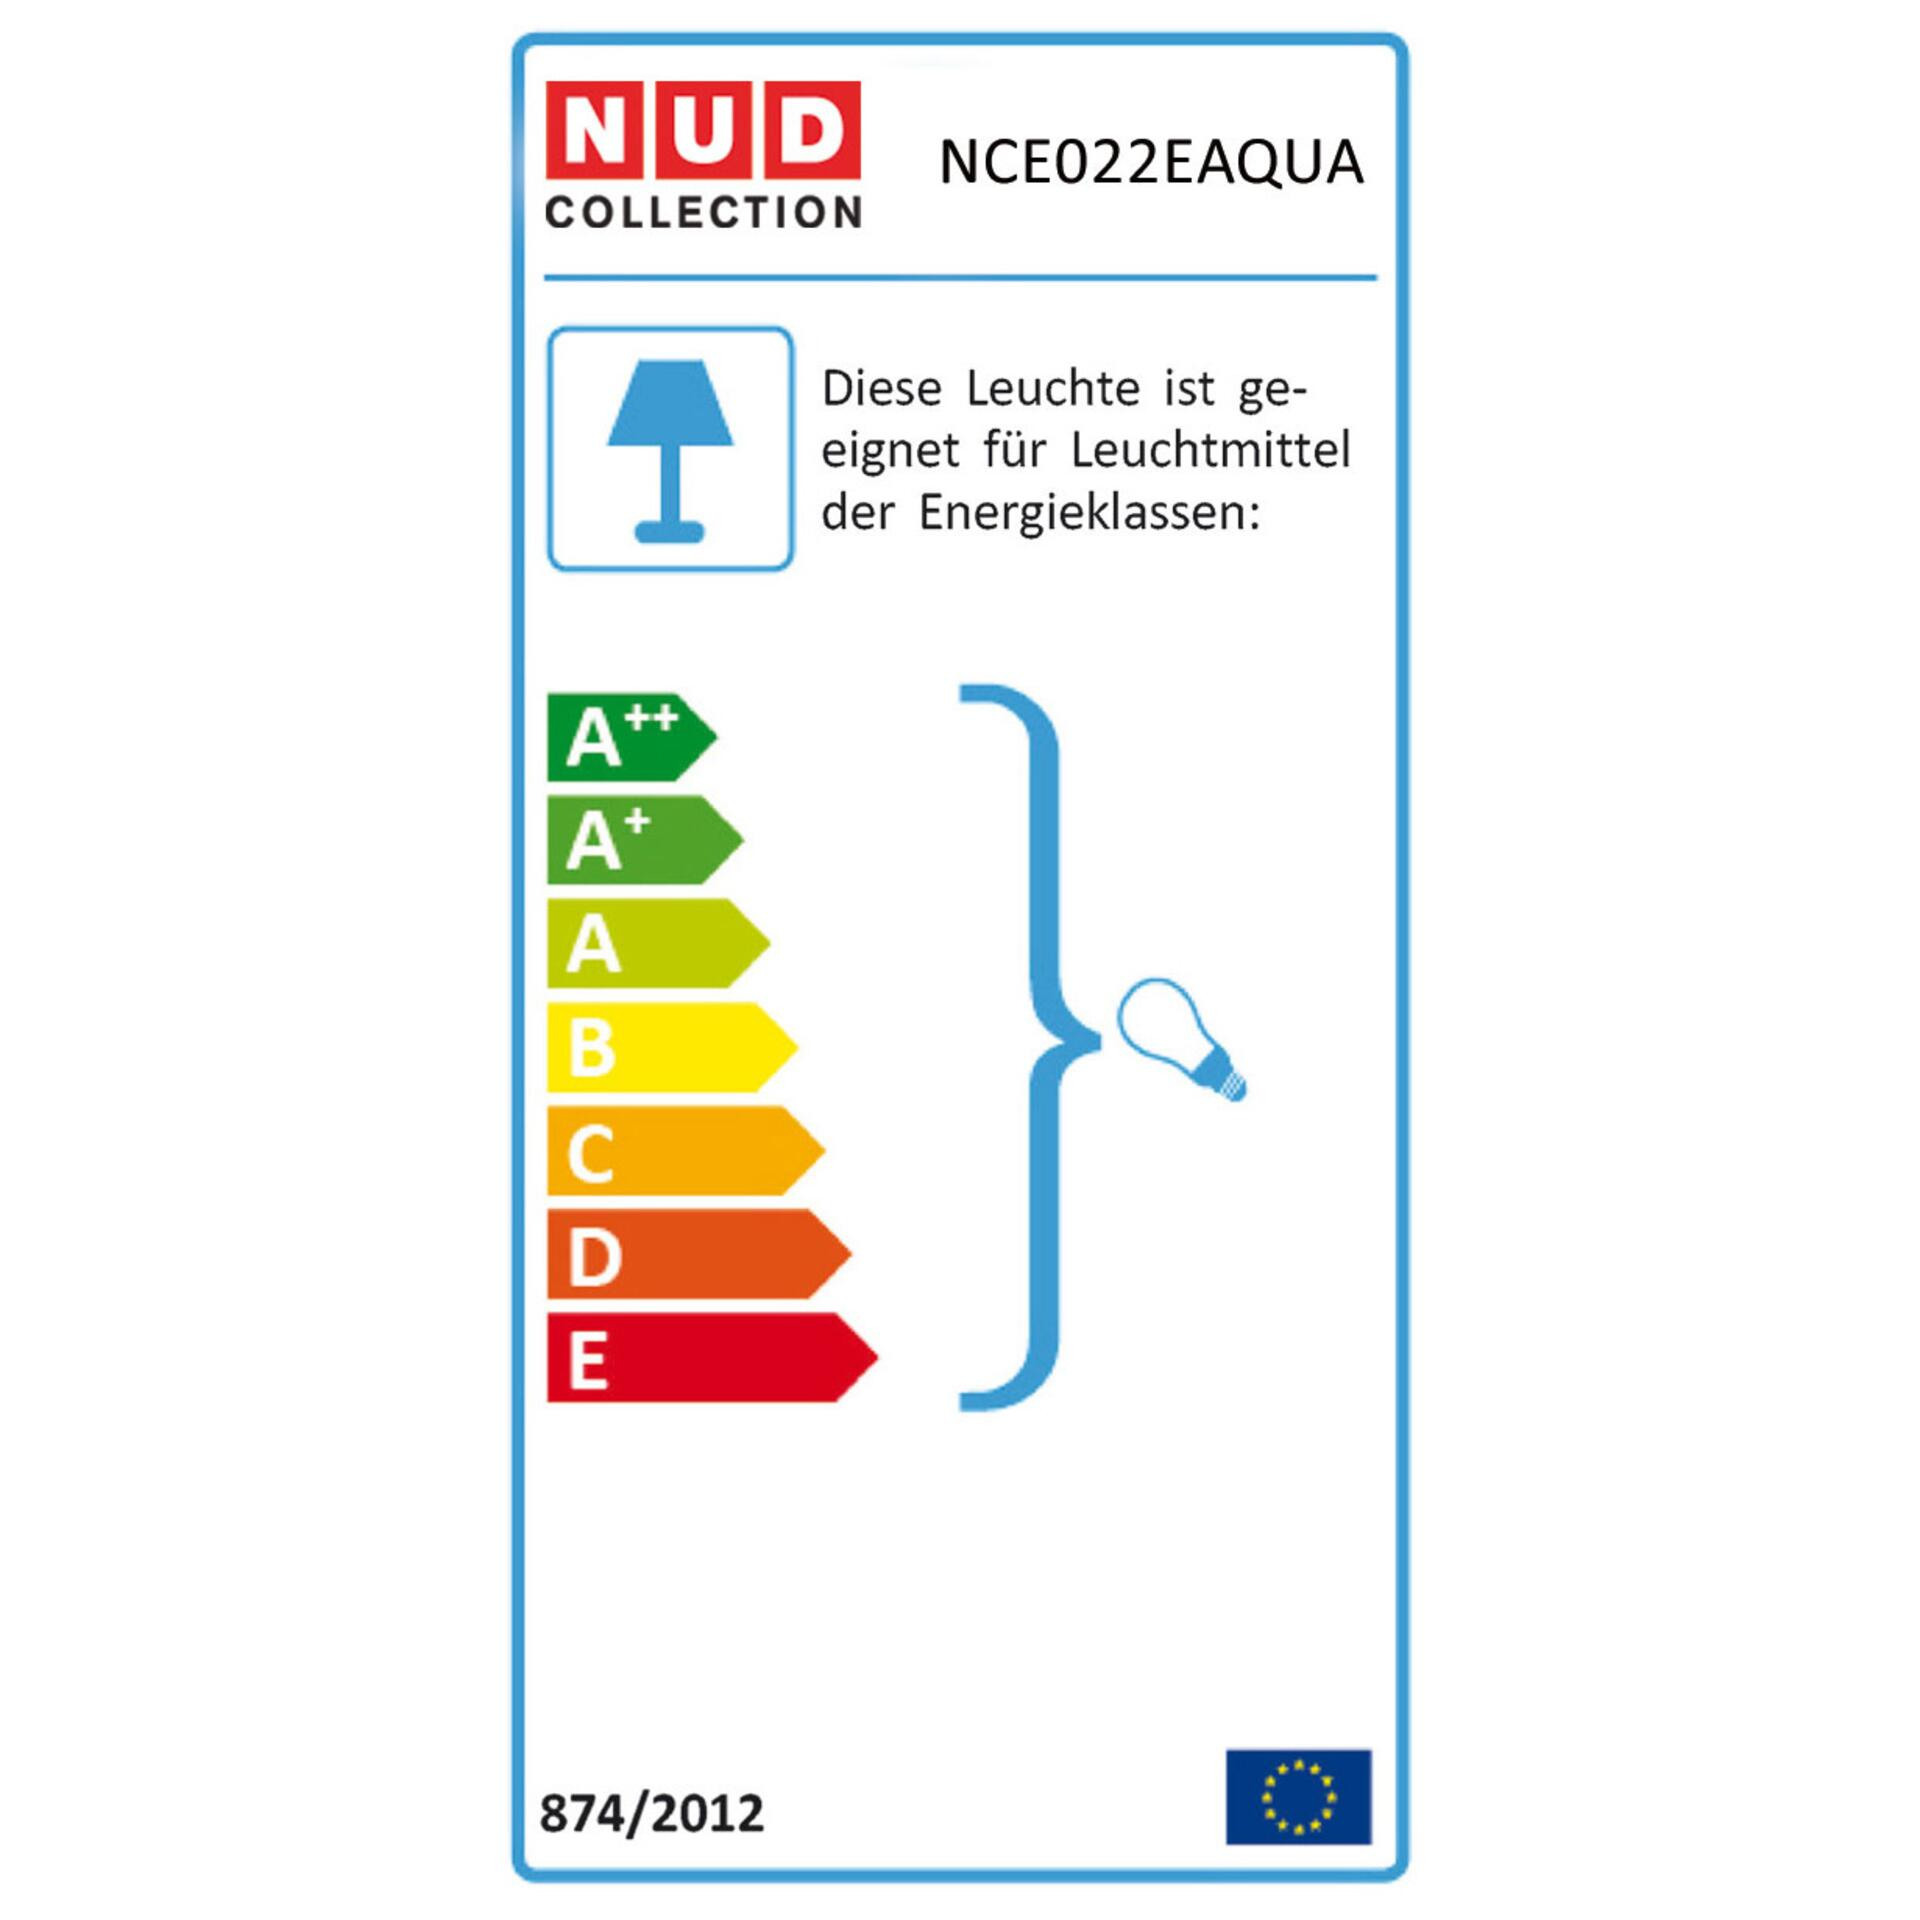 Nud Kupferleuchte Aqua Türkis